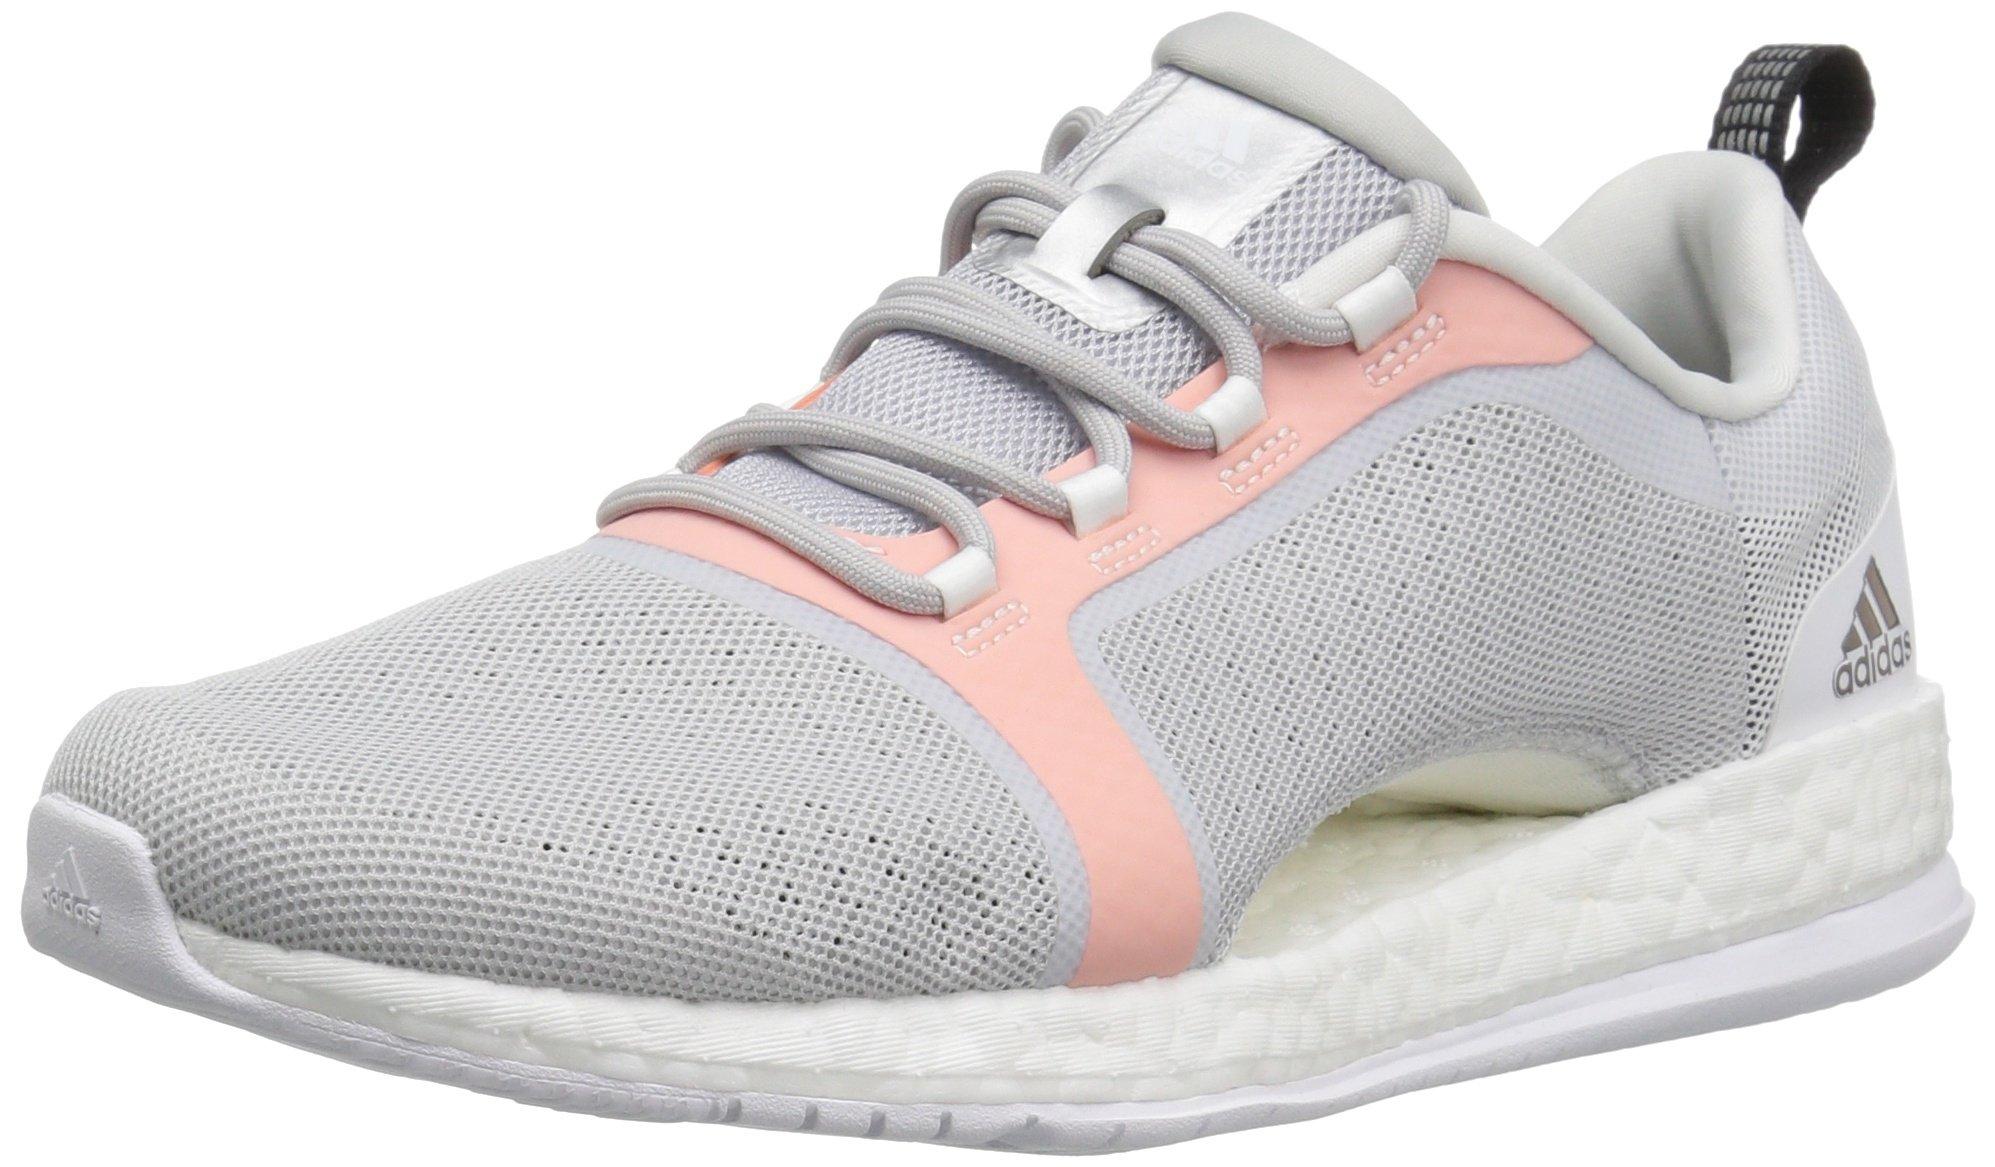 purchase cheap d70dc 2ebb6 adidas Women's Pure Boost X TR 2 Cross-Trainer Shoes, Light Grey/Black/Easy  Orange, (9 M US)